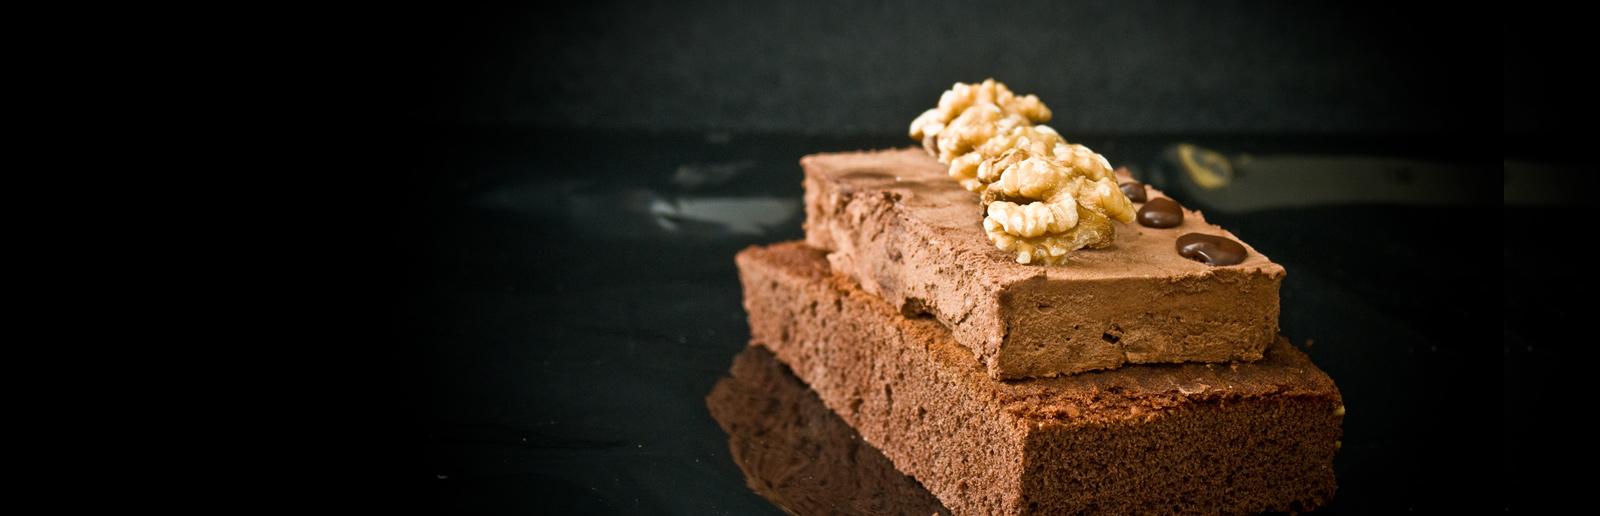 brownie-pasteleria-malaga